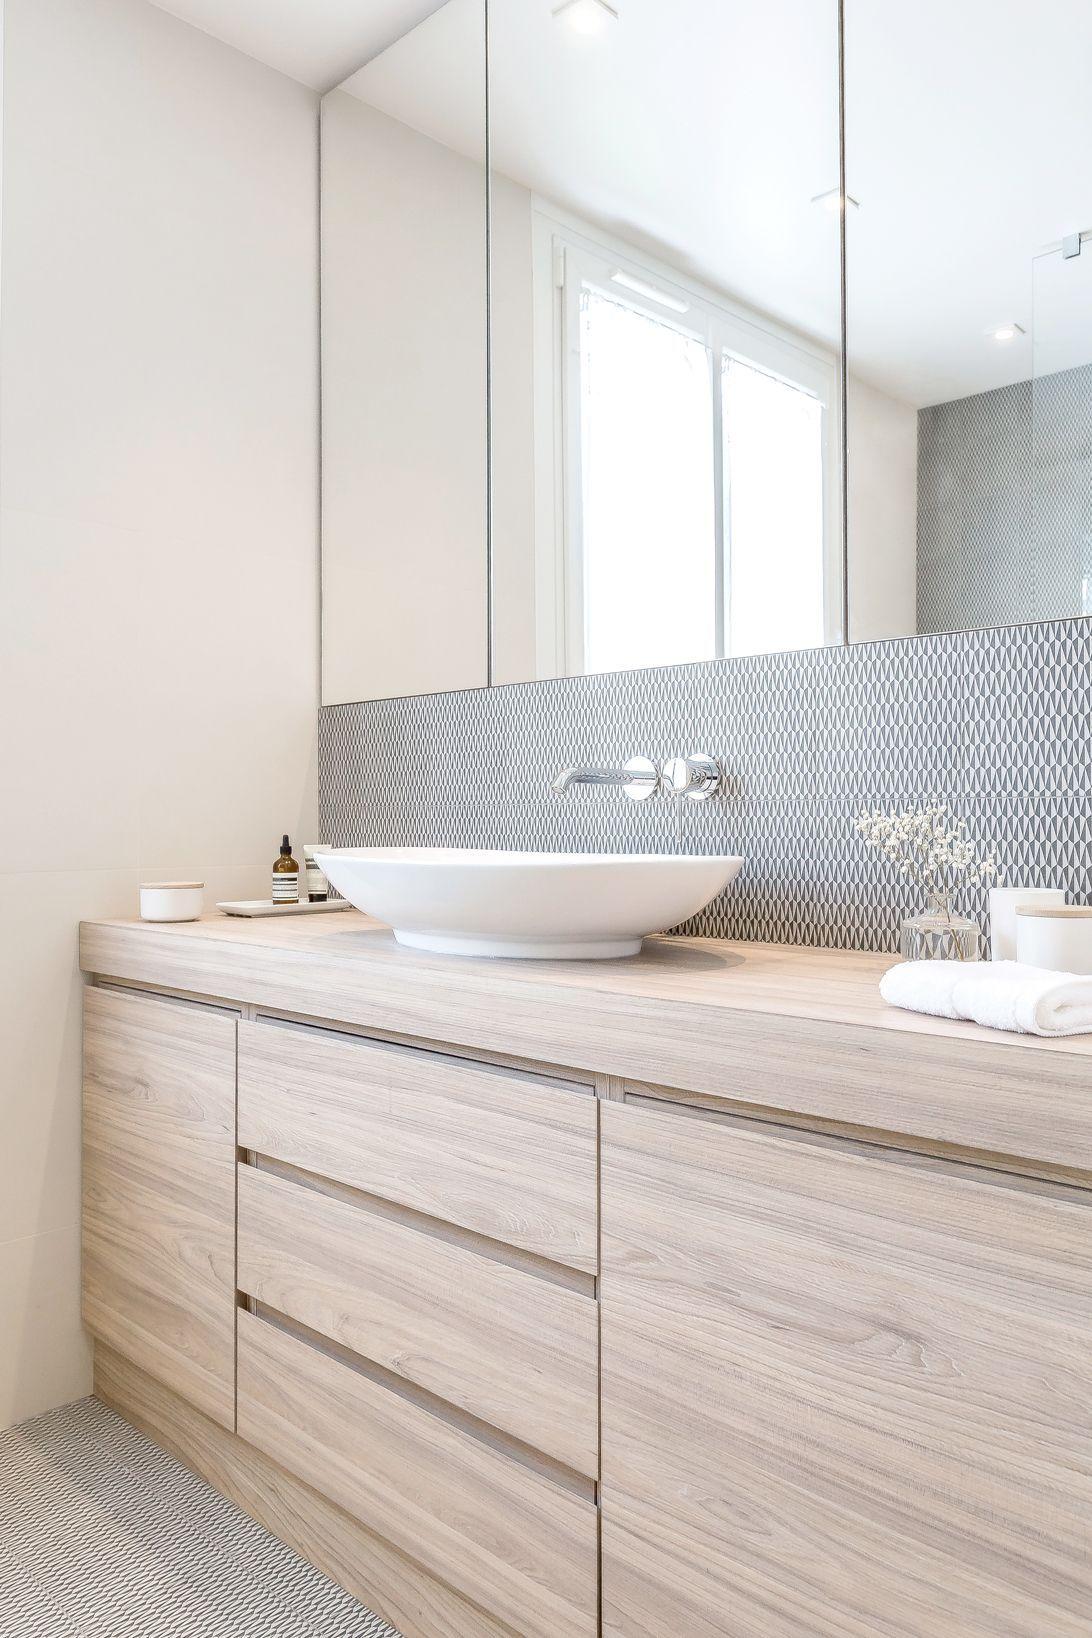 6 Tips To Make Your Bathroom Renovation Look Amazing Bathroom